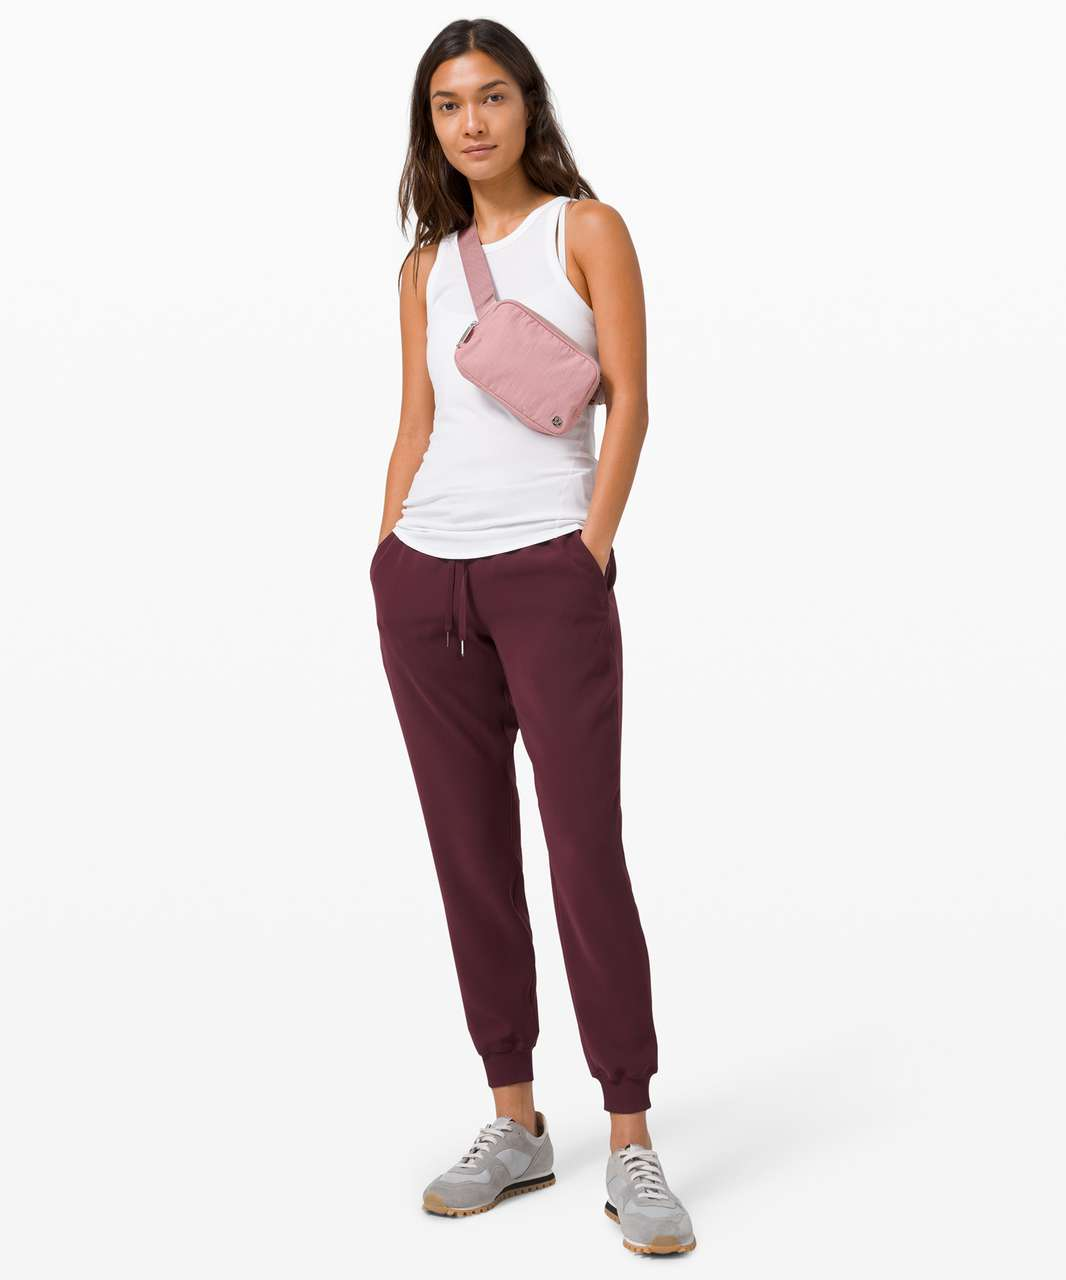 Lululemon Everywhere Belt Bag *1L - Pink Taupe